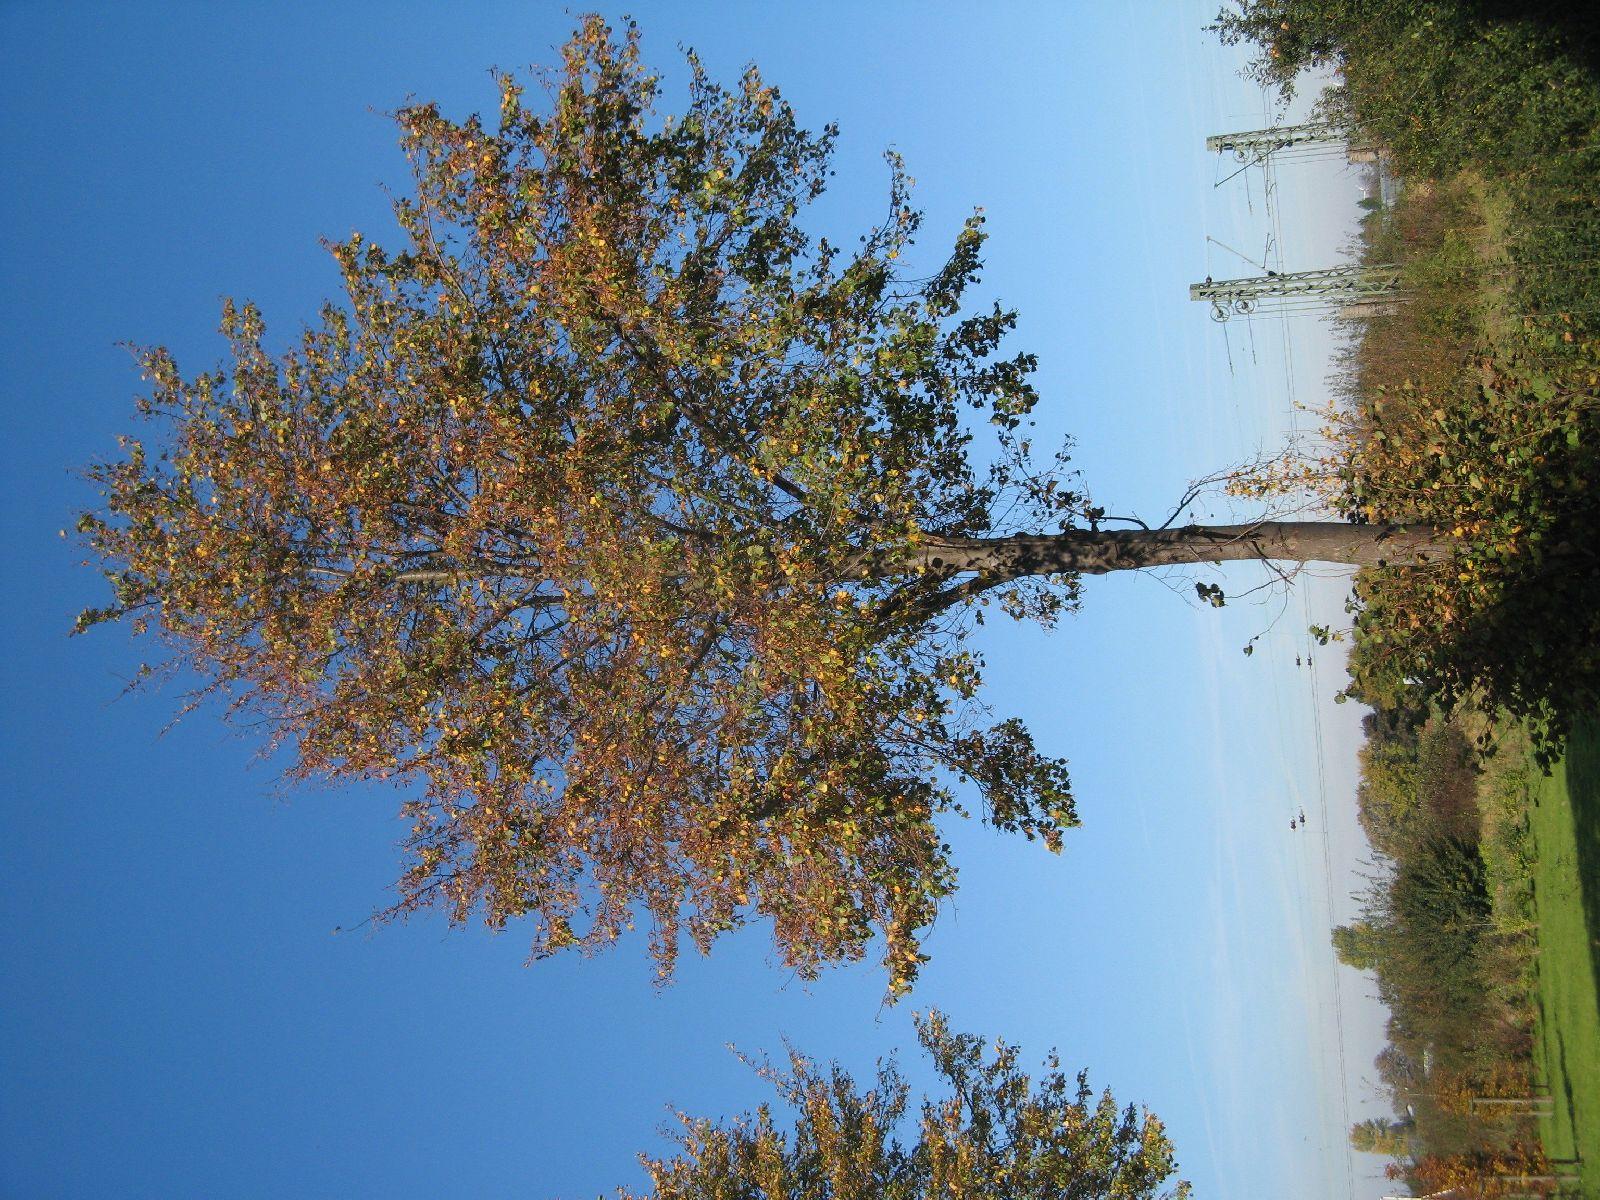 Plants-Trees_Photo_Texture_B_3732